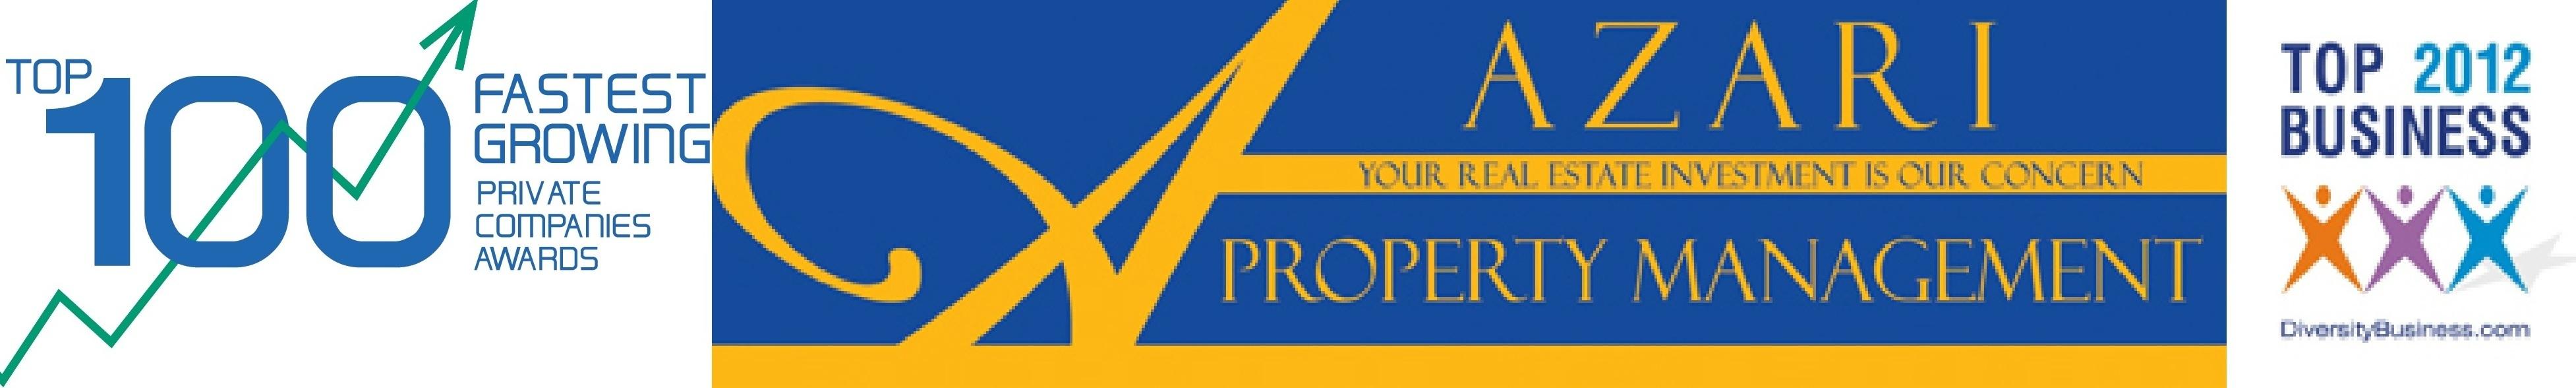 Azari Property Management Franchise